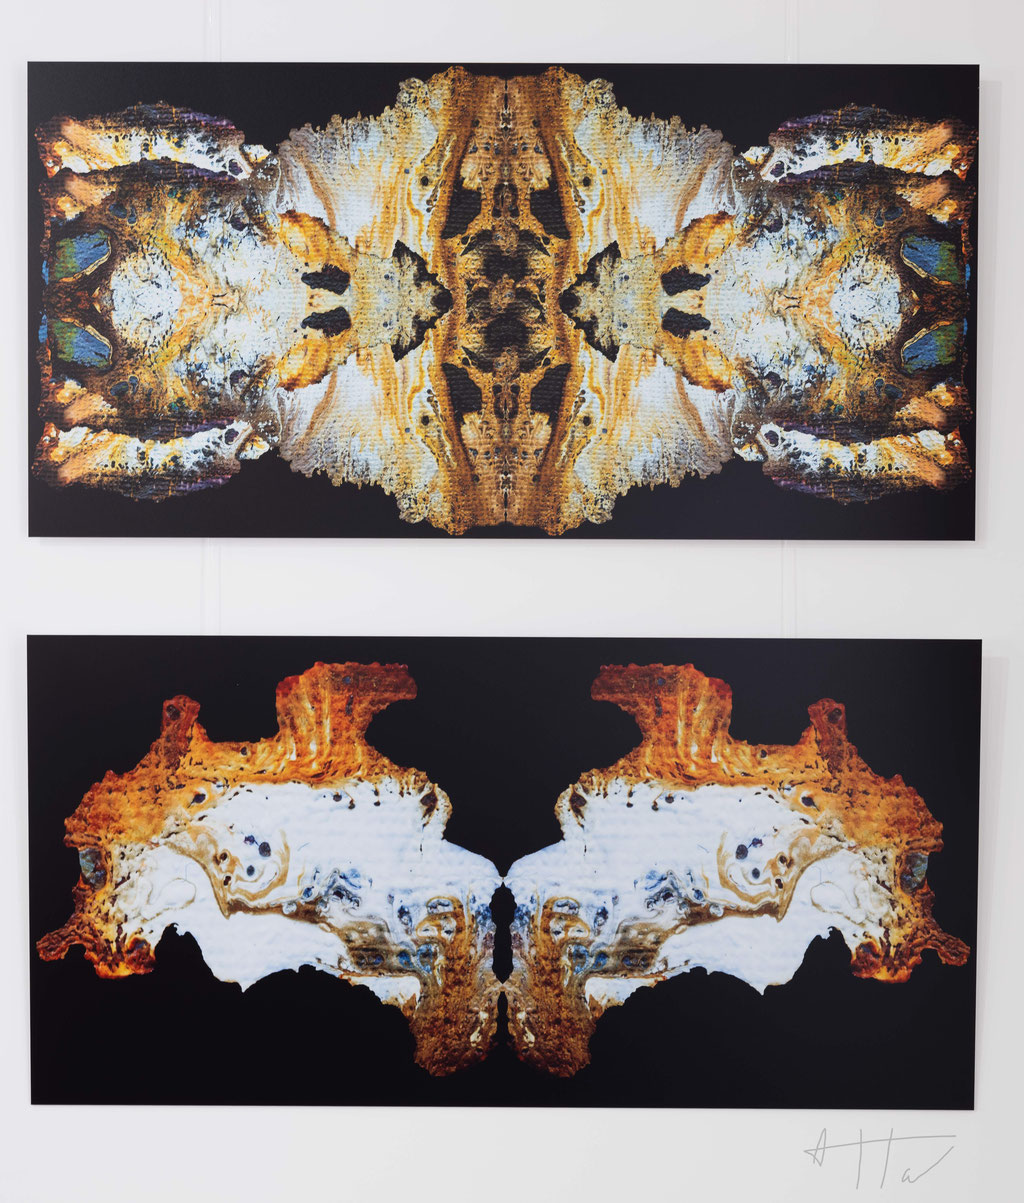 Skullpture (top), Les sentinelles (bottom), aluminium dibond, 50 cm x 100 cm, series of 5 prints + 2 AP (each artwork).